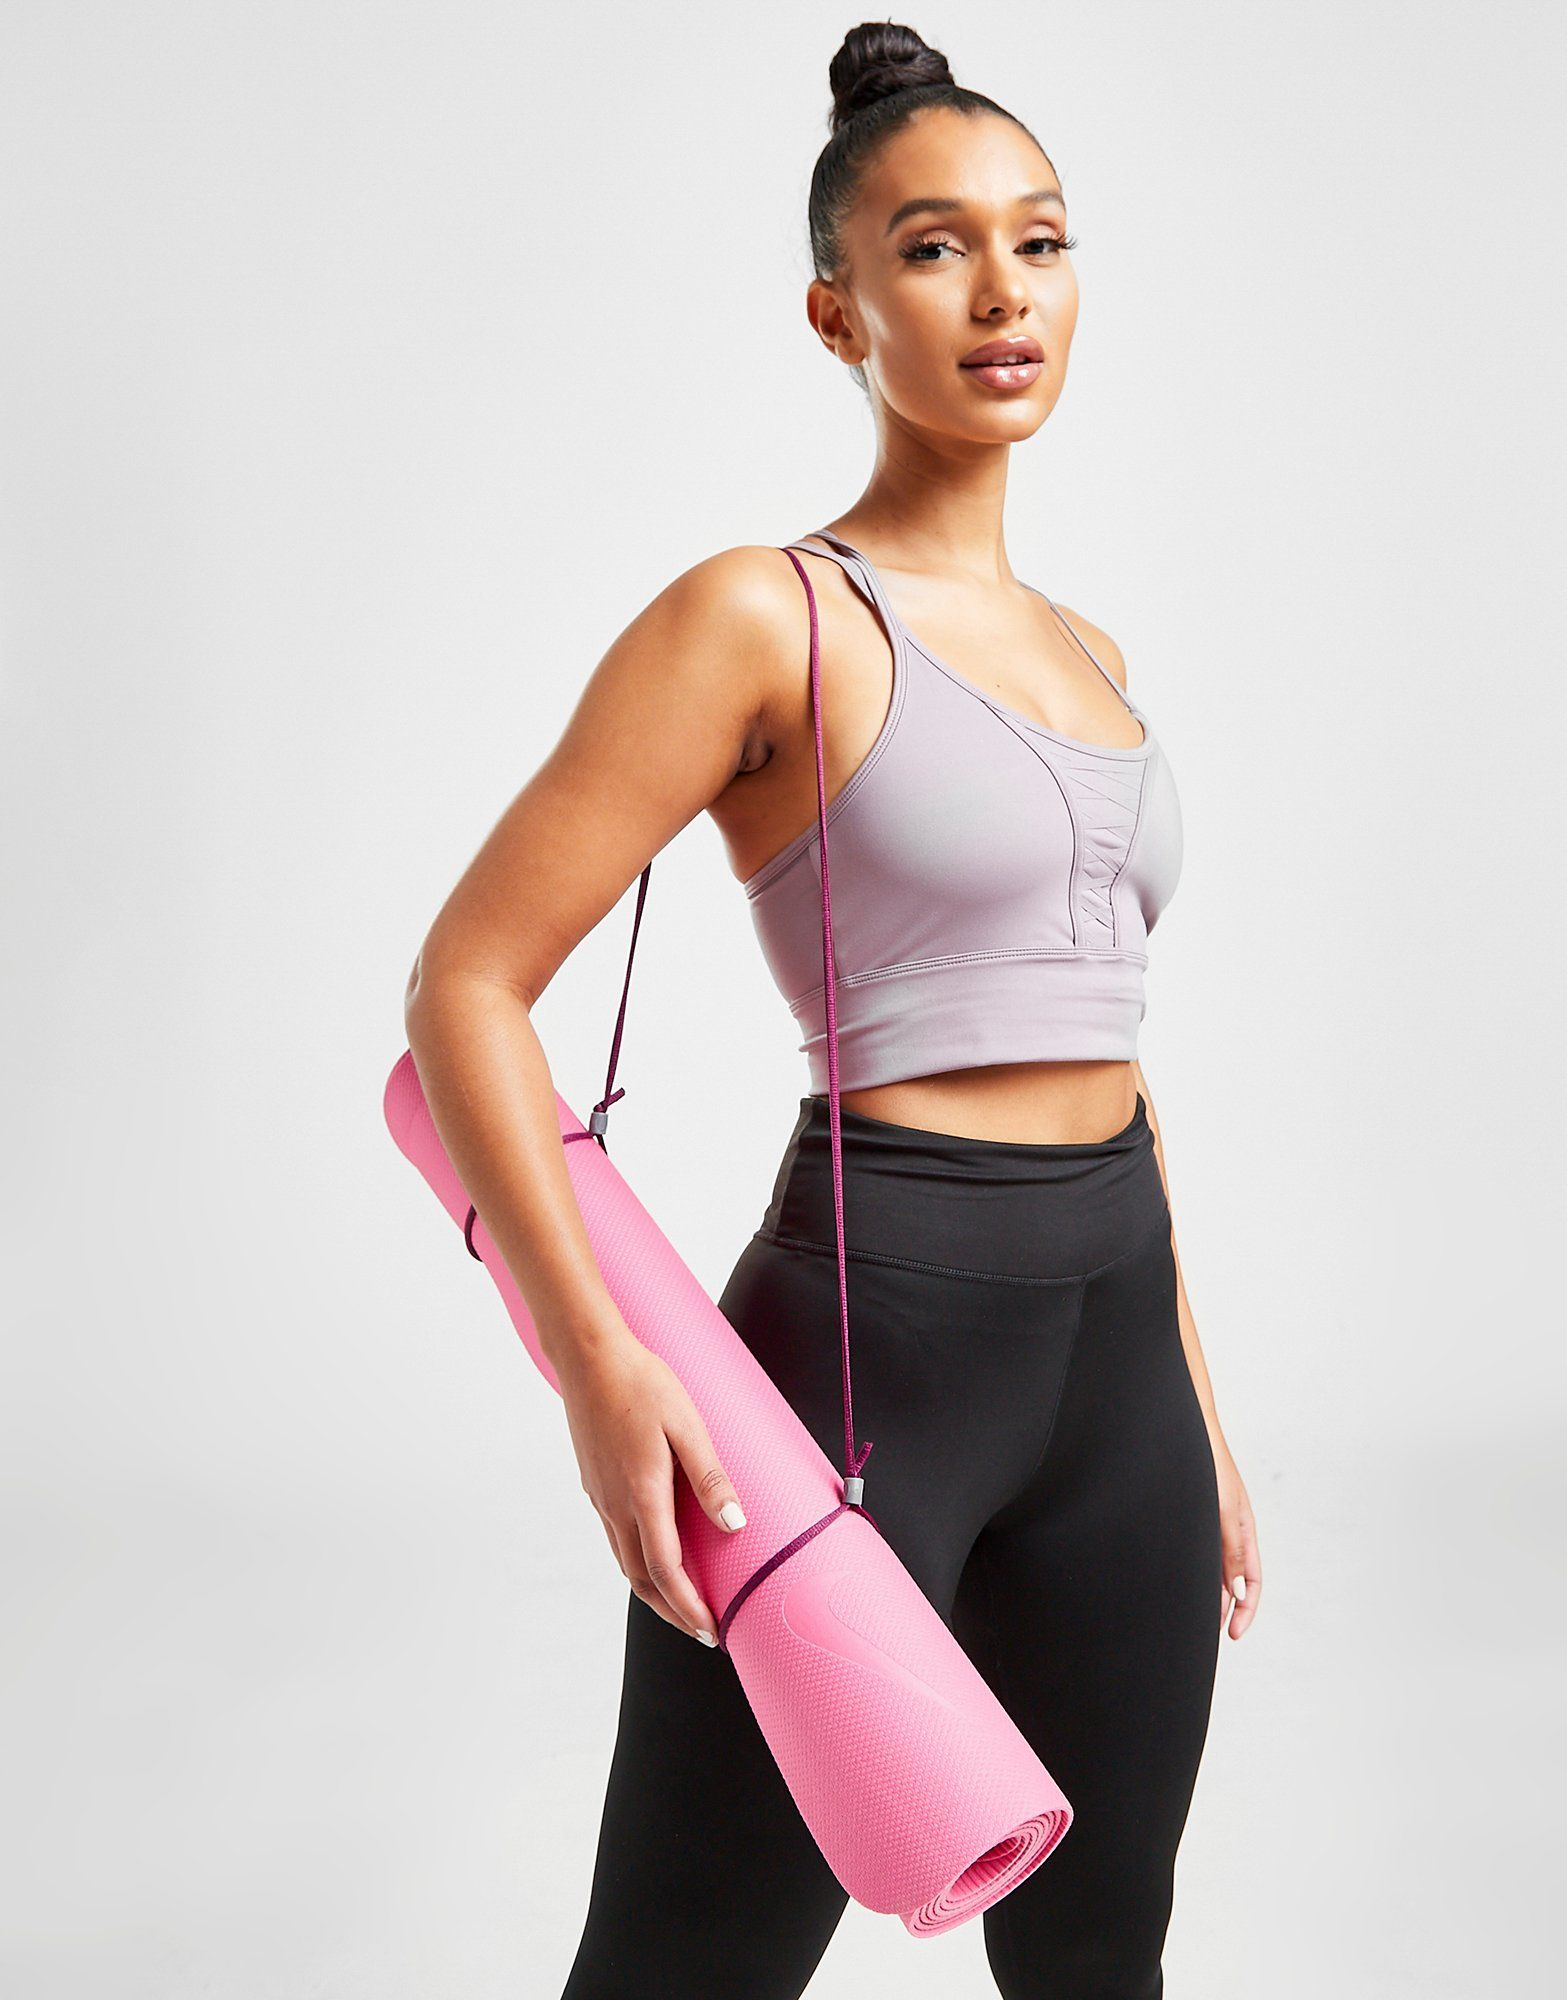 Nike 3mm Yoga Mat